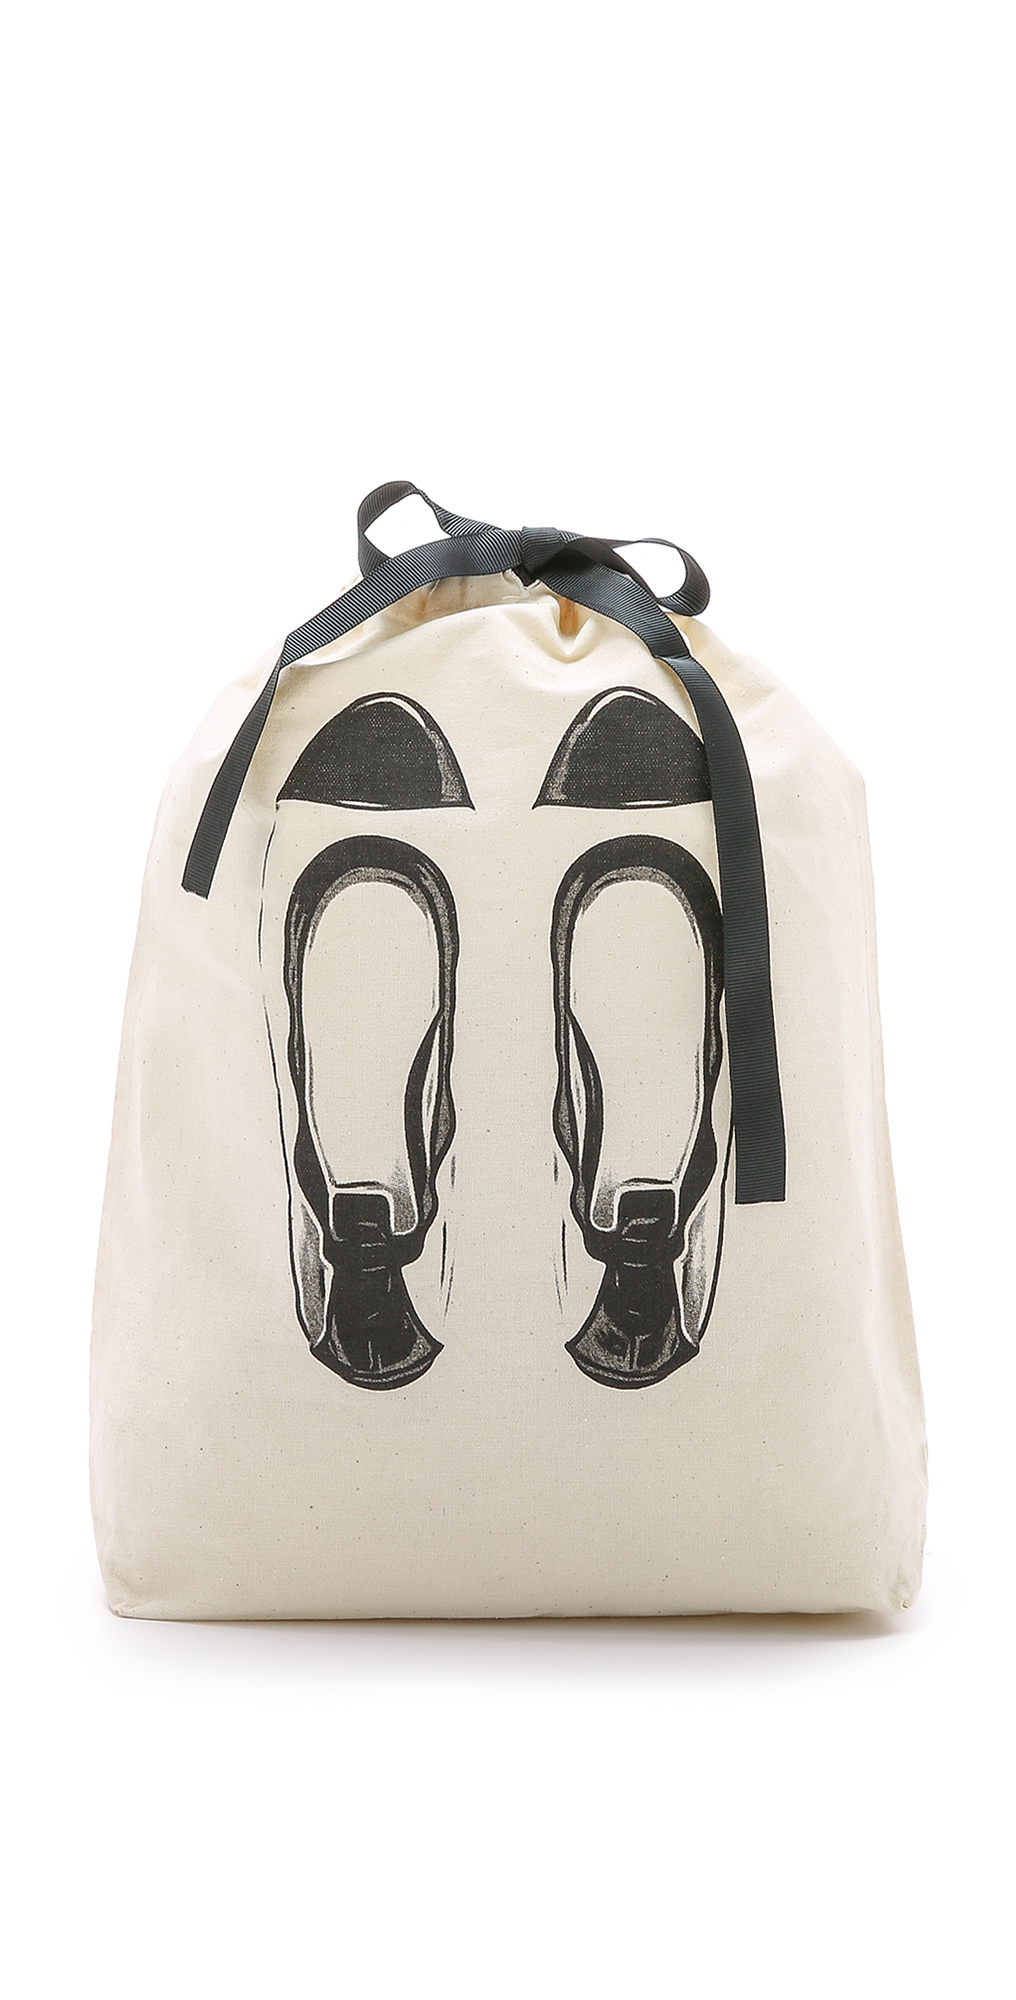 Ballet Flats Organizing Bag